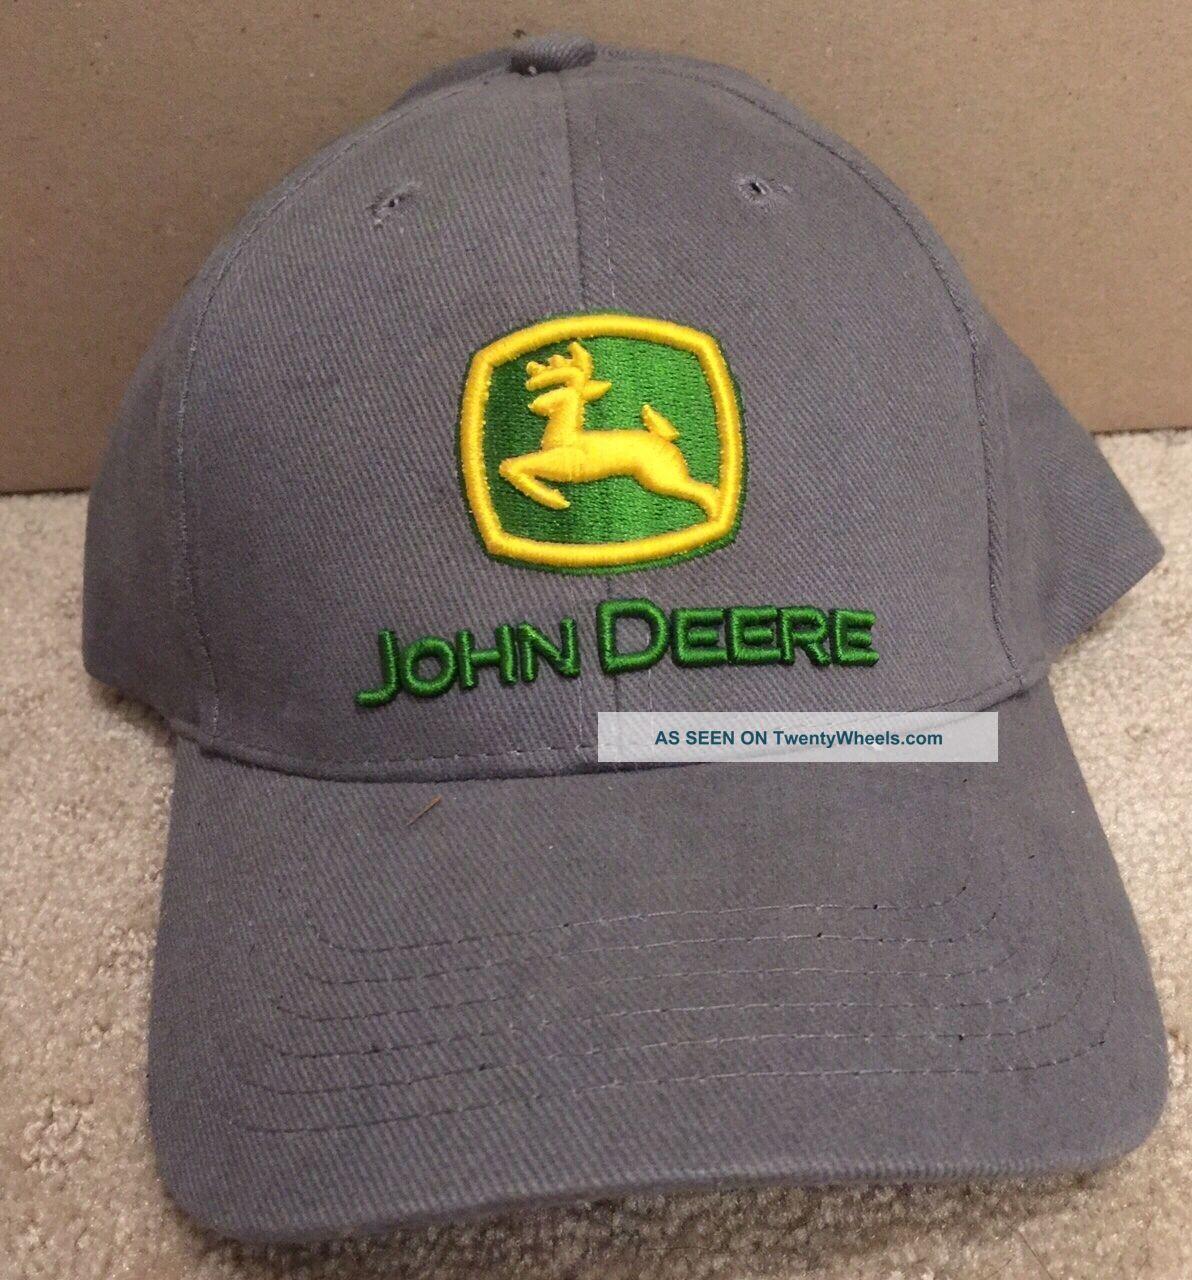 John Deere Baseball Cap Hat Grey Uncategorized photo